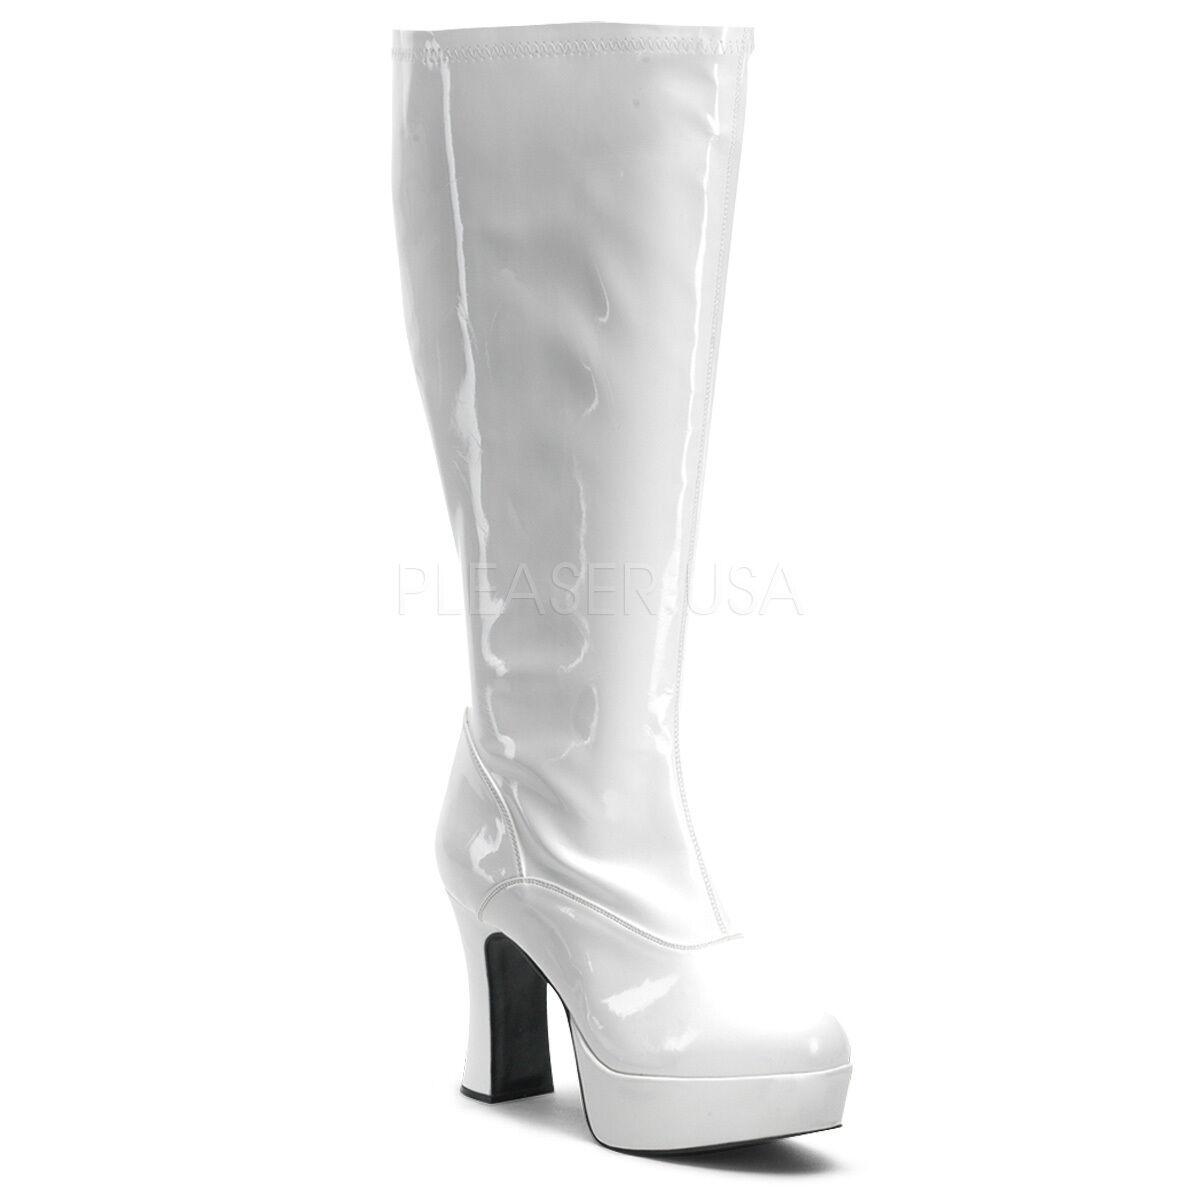 Sexy WIDE WIDTH WIDE CALF White 4  Heels Platform Costume Gogo Dancer Knee Boots